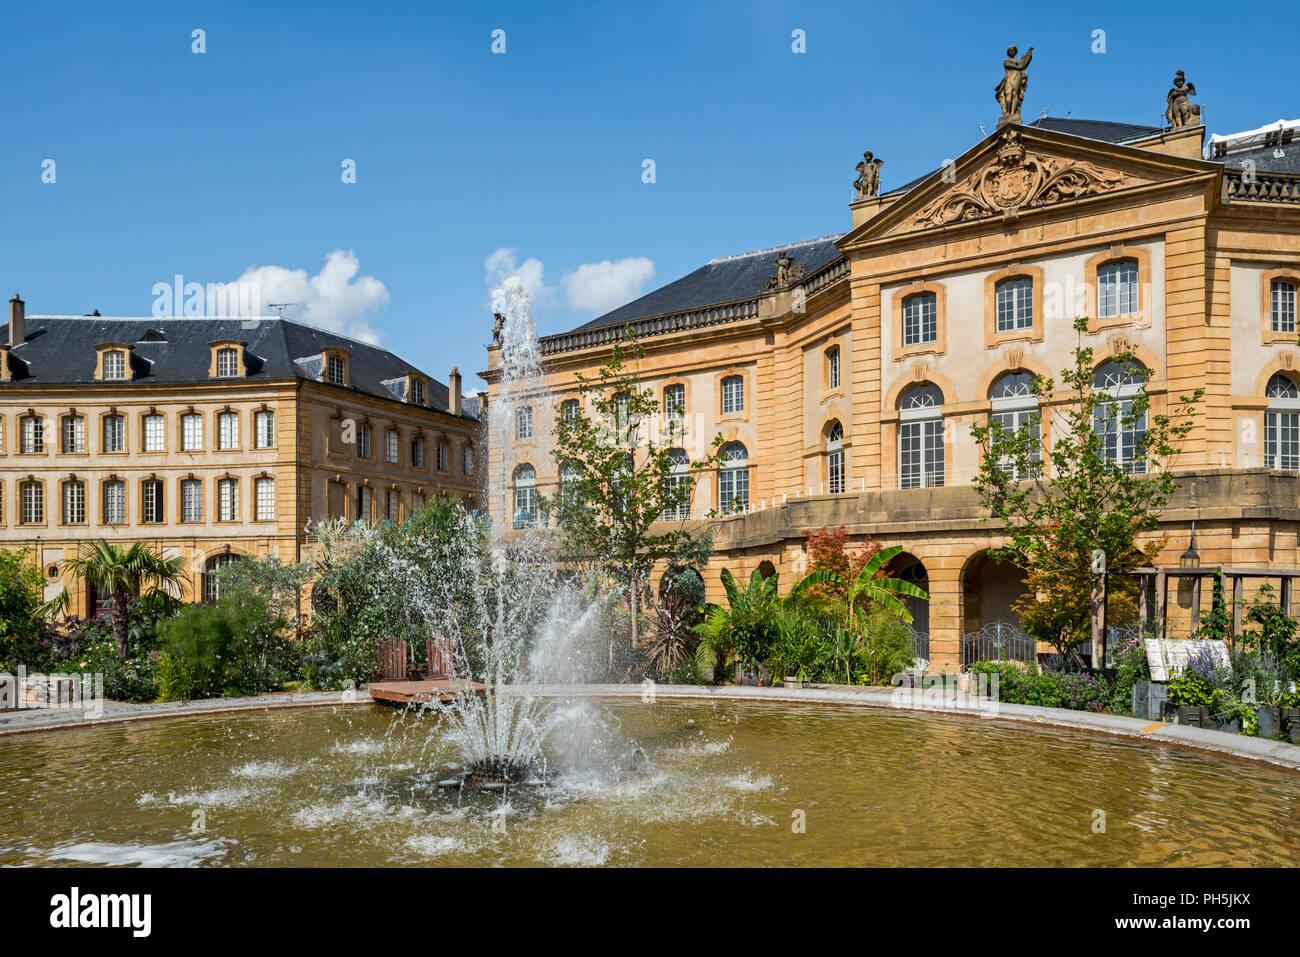 18. jahrhundert Nähe des Operntheaters de Metz Métropole, Oper und Theater an der Place de la Comédie/Komödie Platz der Stadt Metz, Moselle, Frankreich Stockbild